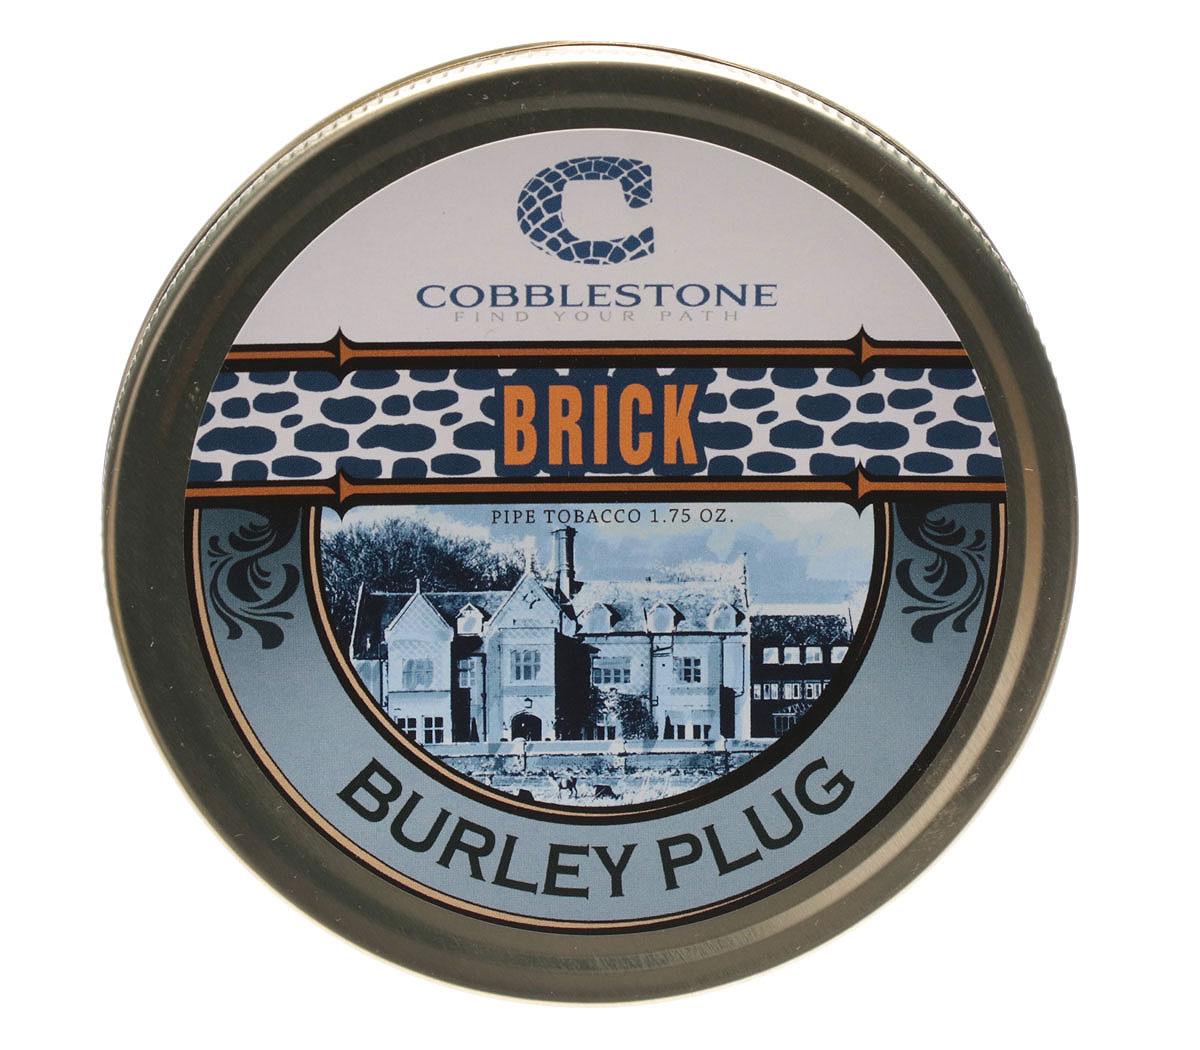 Cobblestone Brick Burley Plug 1.75oz